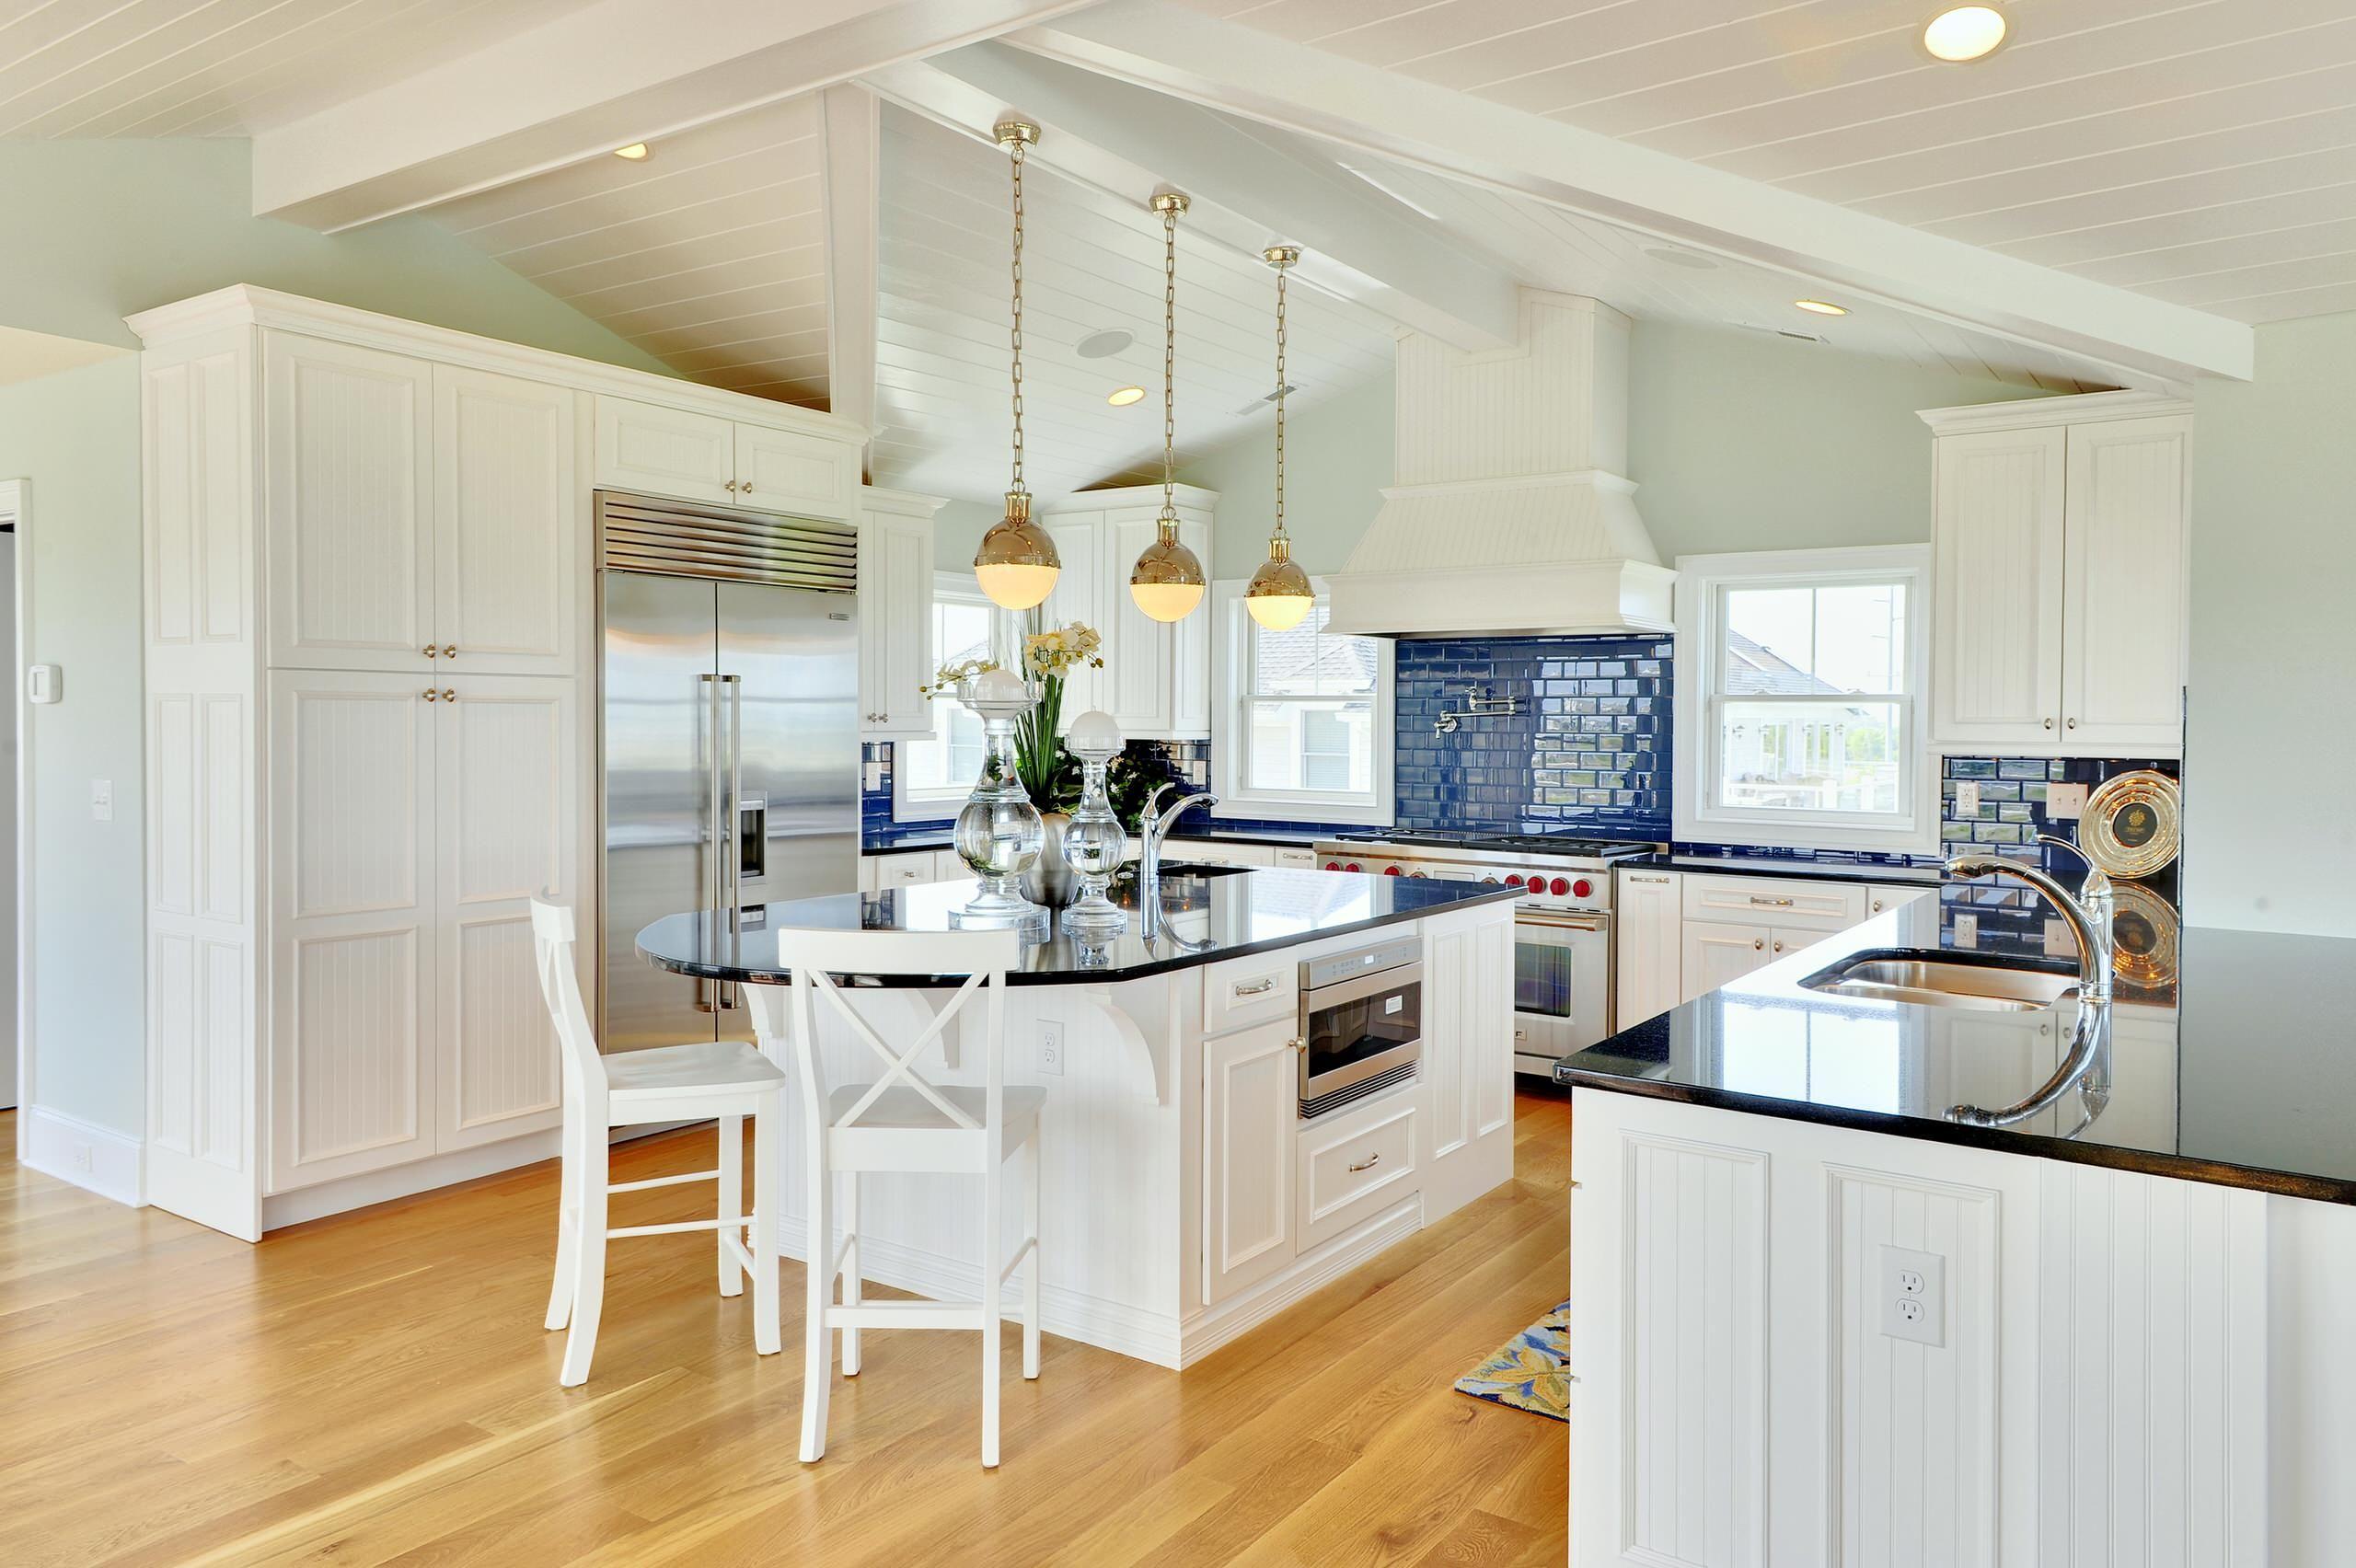 Image result for red oak home interior modern | Interior | Pinterest ...